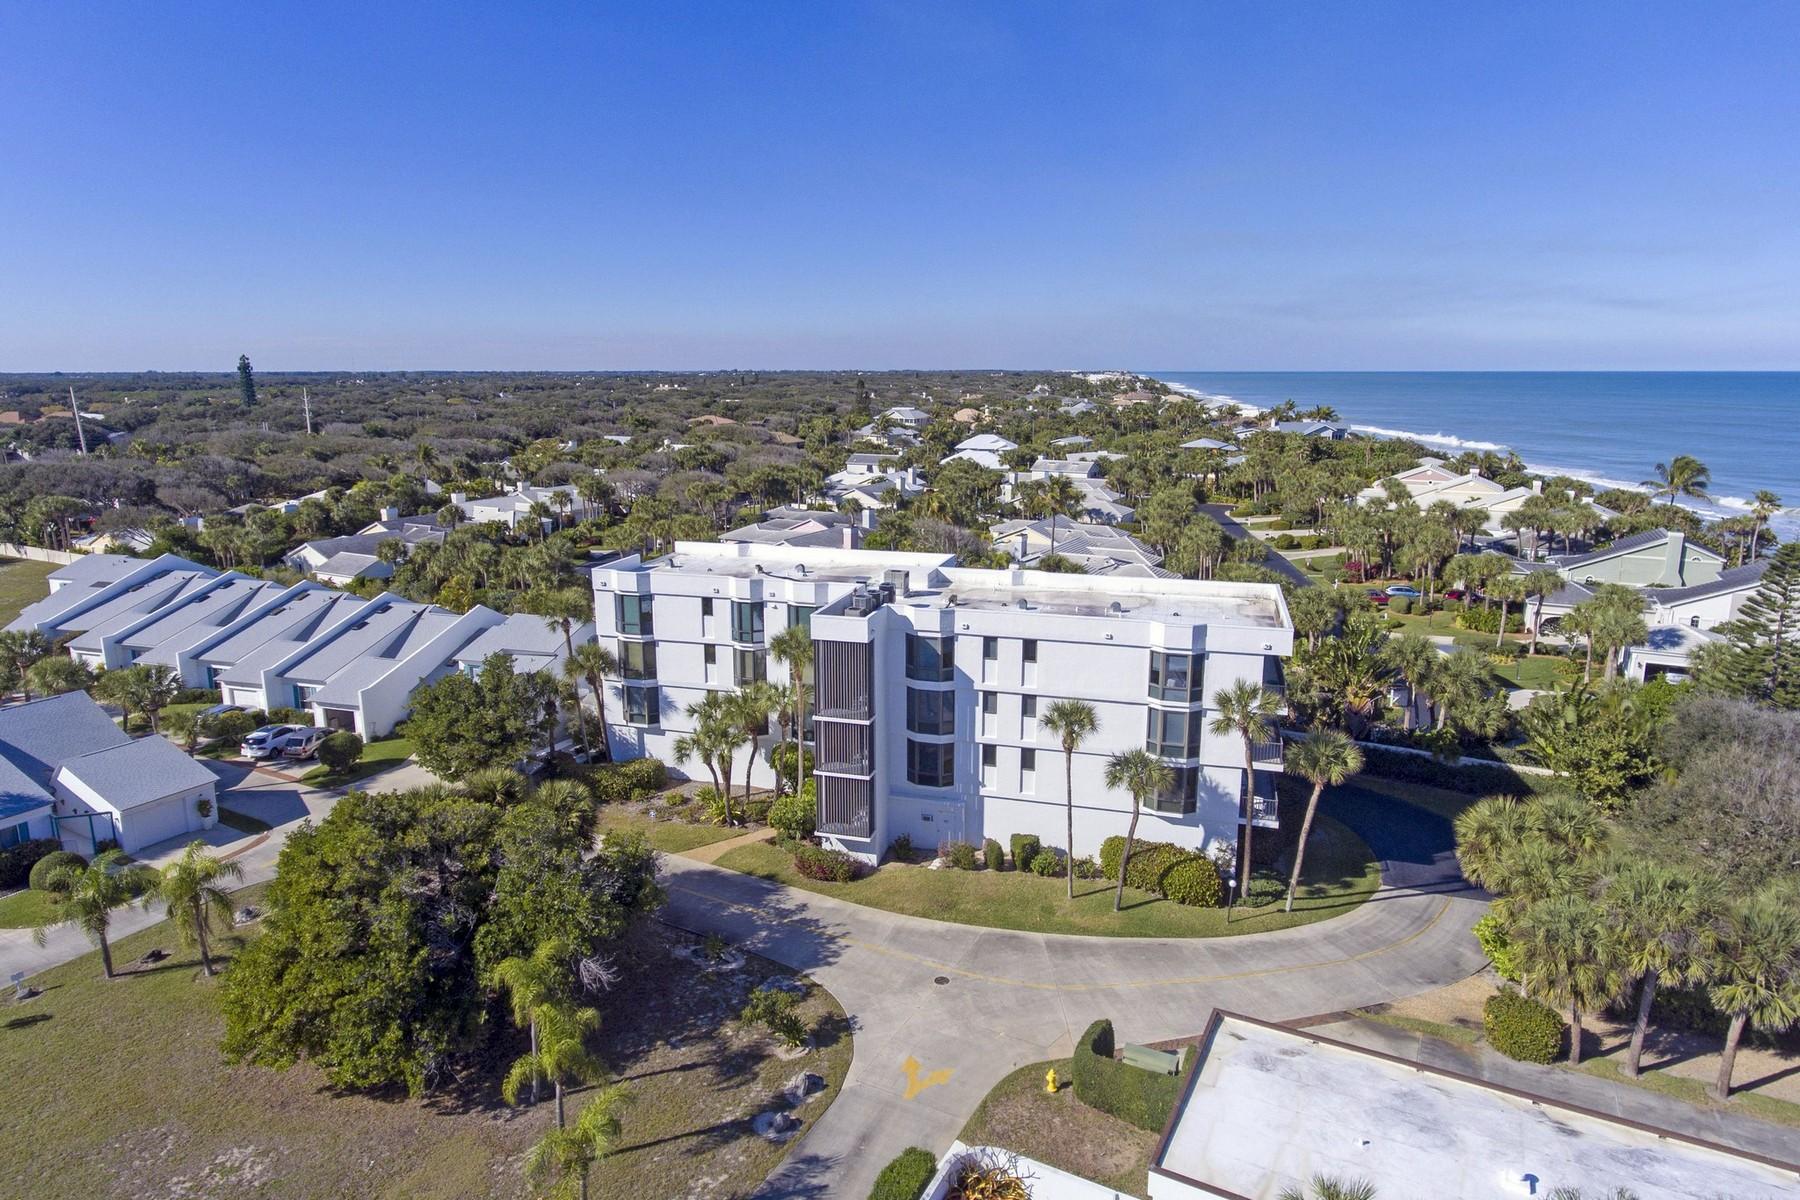 Condominium for Sale at Second Floor Condo With Ocean Views 5810 Highway A1A #2B Vero Beach, Florida 32963 United States